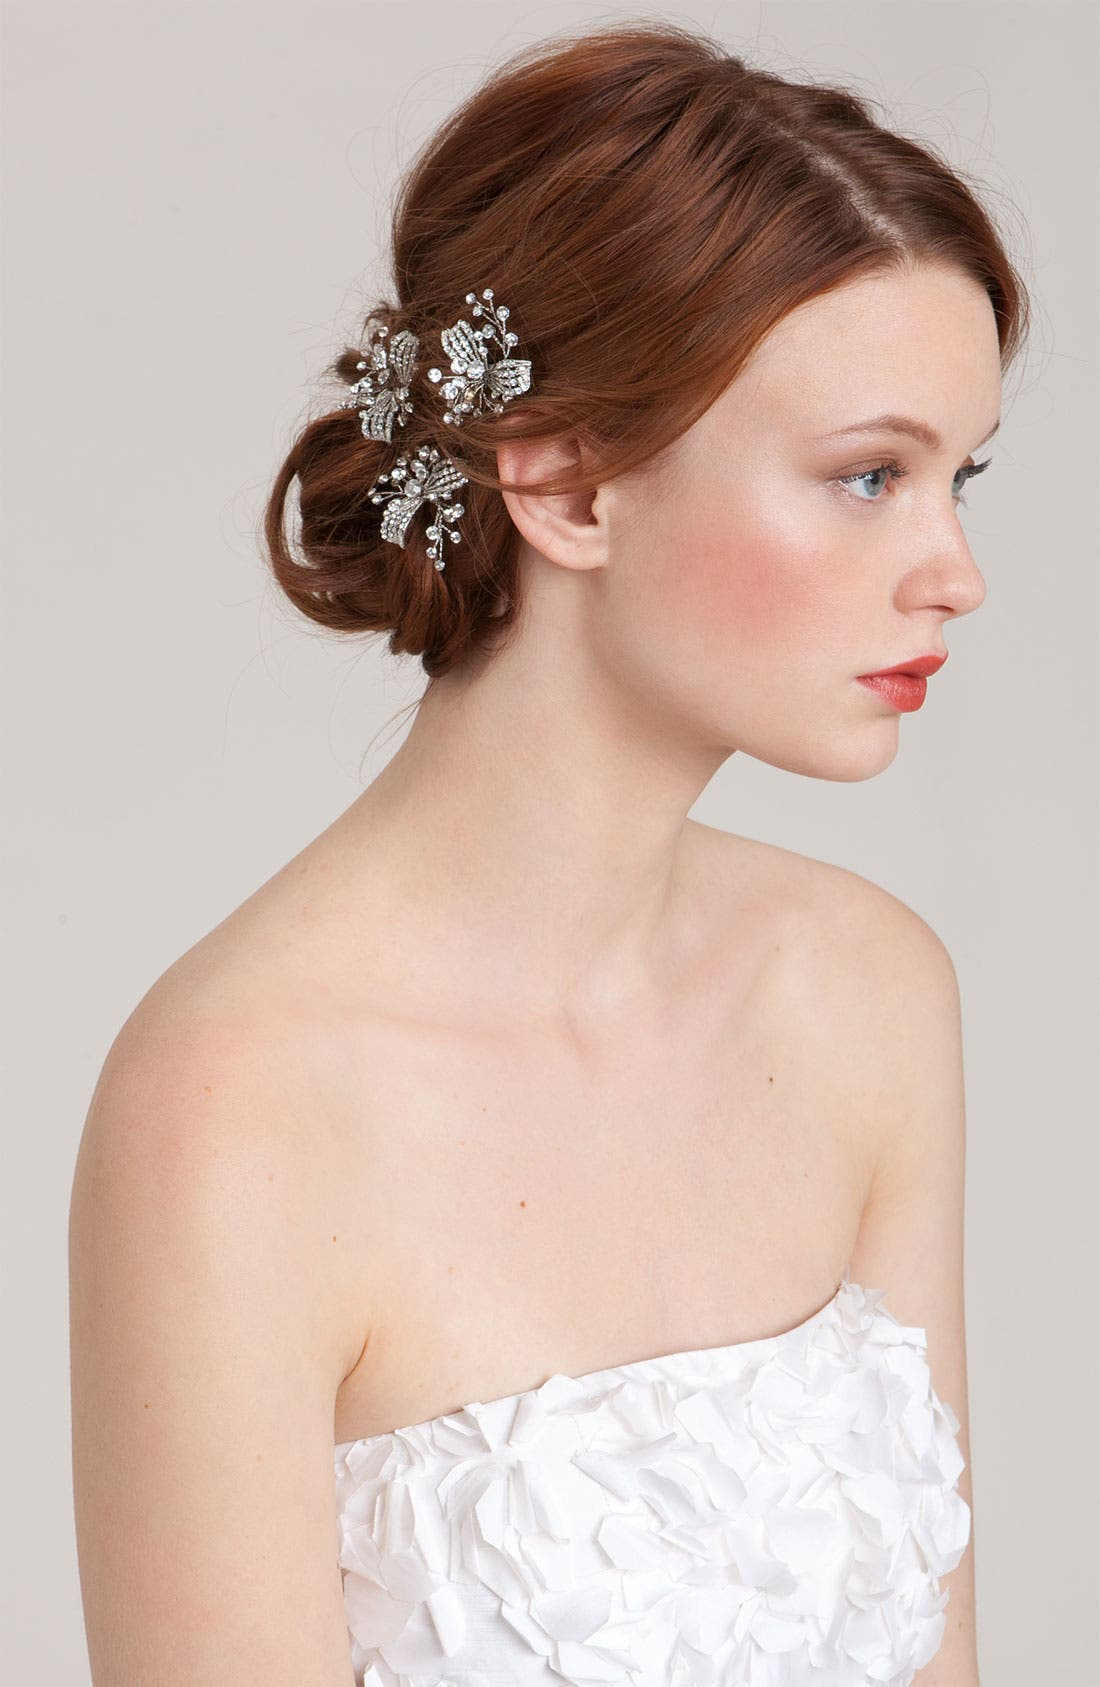 Alternate Image 1 Selected - Nina 'Gwenyth' Crystal Hairpins (Three-Pack)